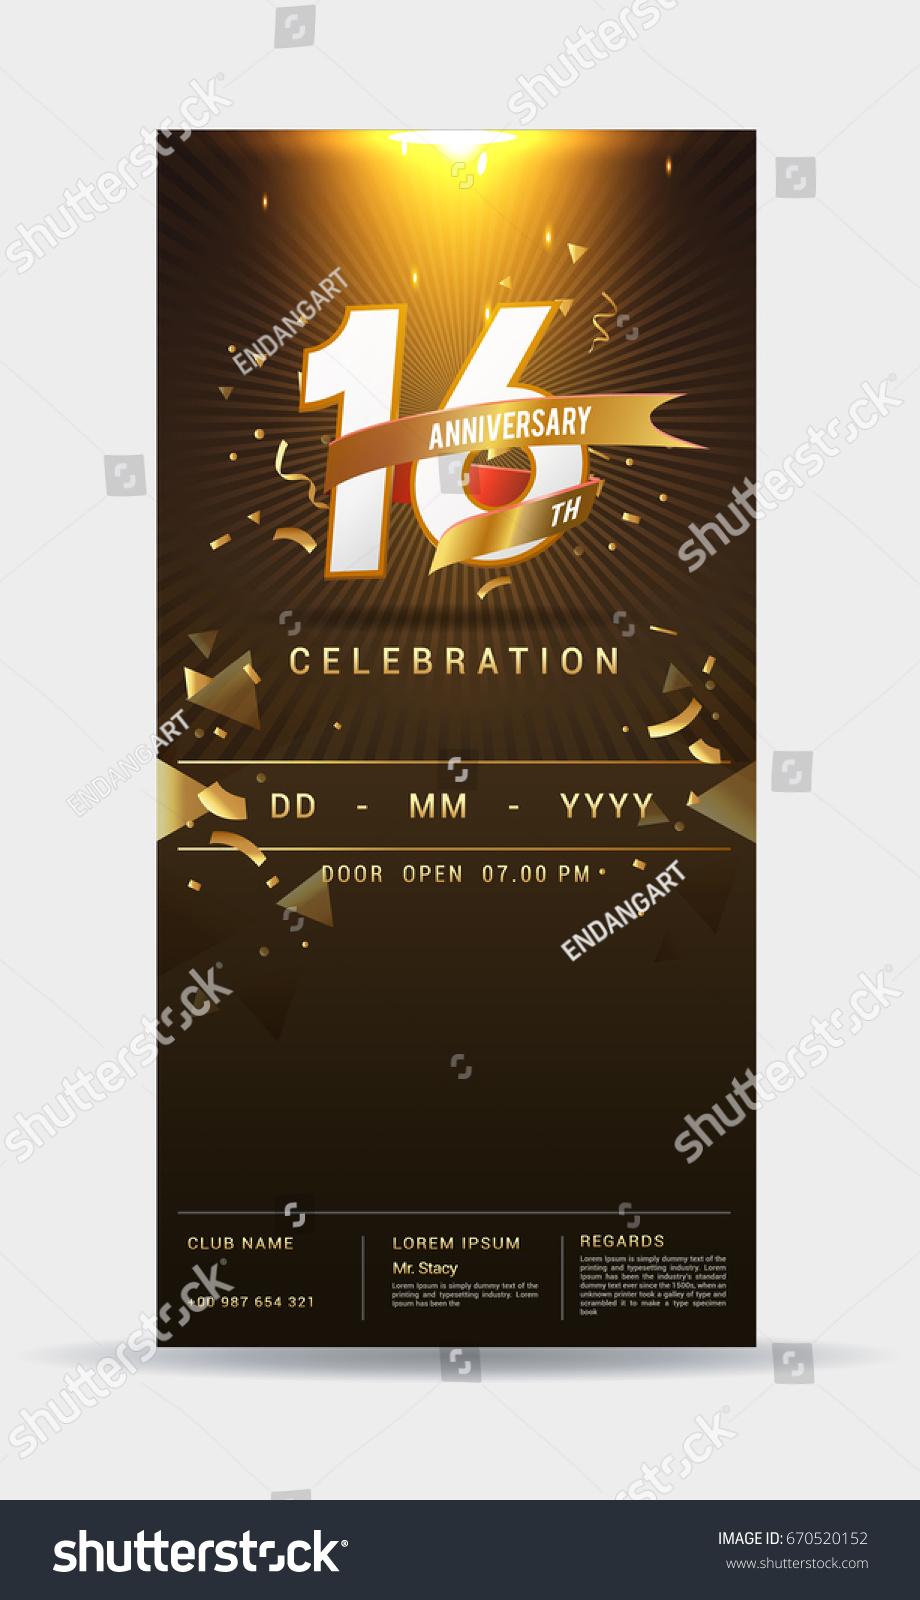 16 years anniversary invitation card shiny stock vector 670520152 16 years anniversary invitation card shiny stock vector 670520152 shutterstock stopboris Images